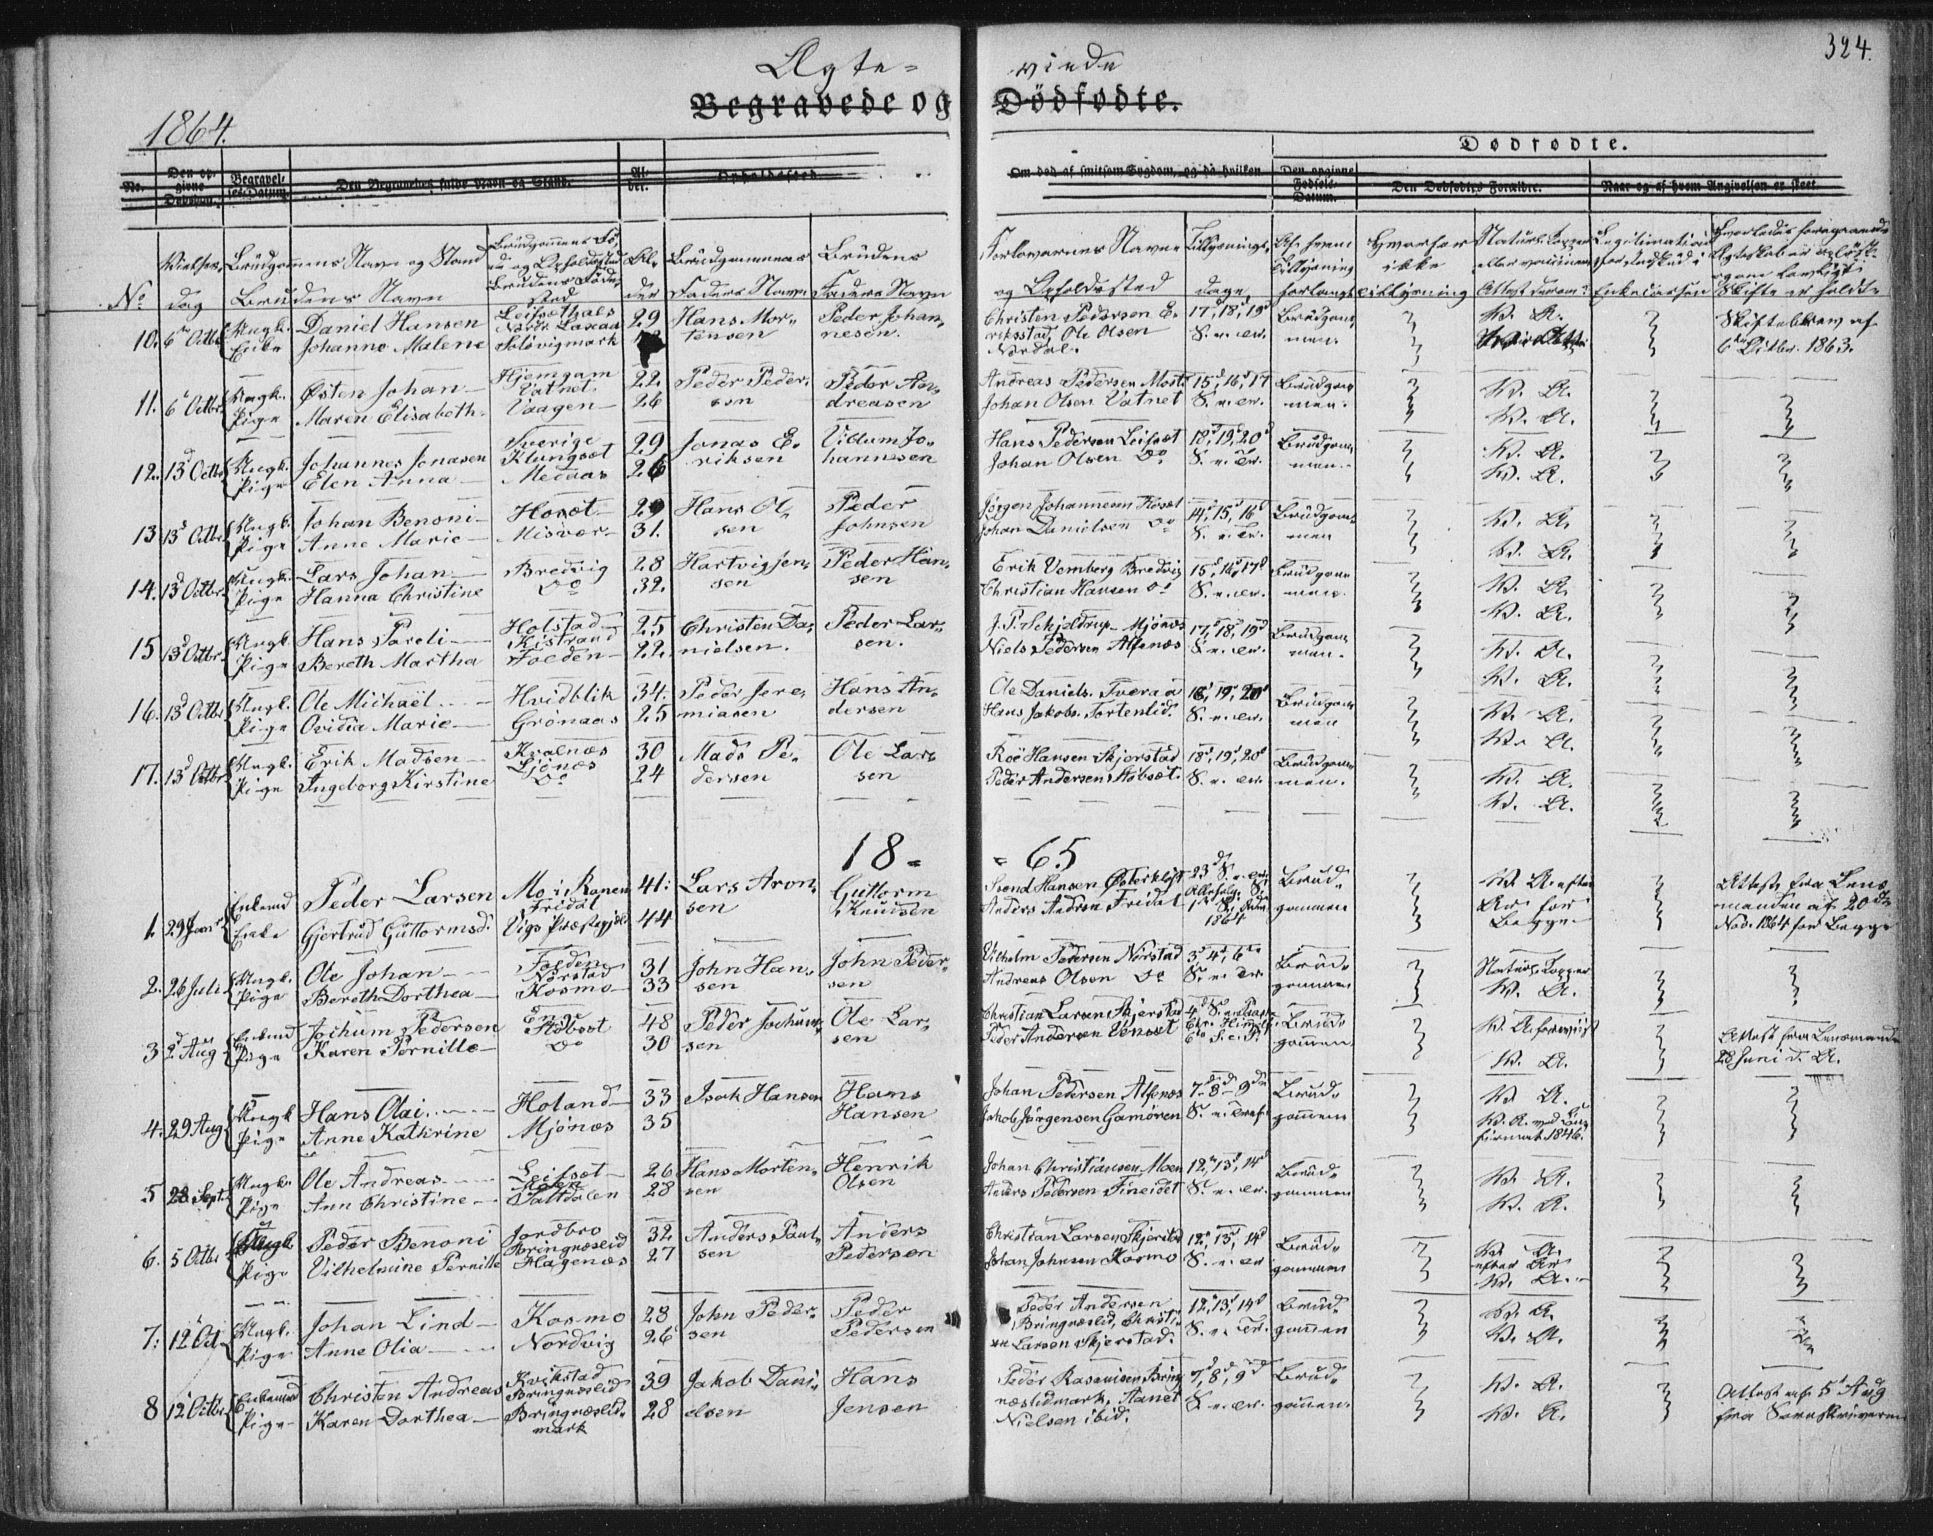 SAT, Ministerialprotokoller, klokkerbøker og fødselsregistre - Nordland, 852/L0738: Ministerialbok nr. 852A08, 1849-1865, s. 324